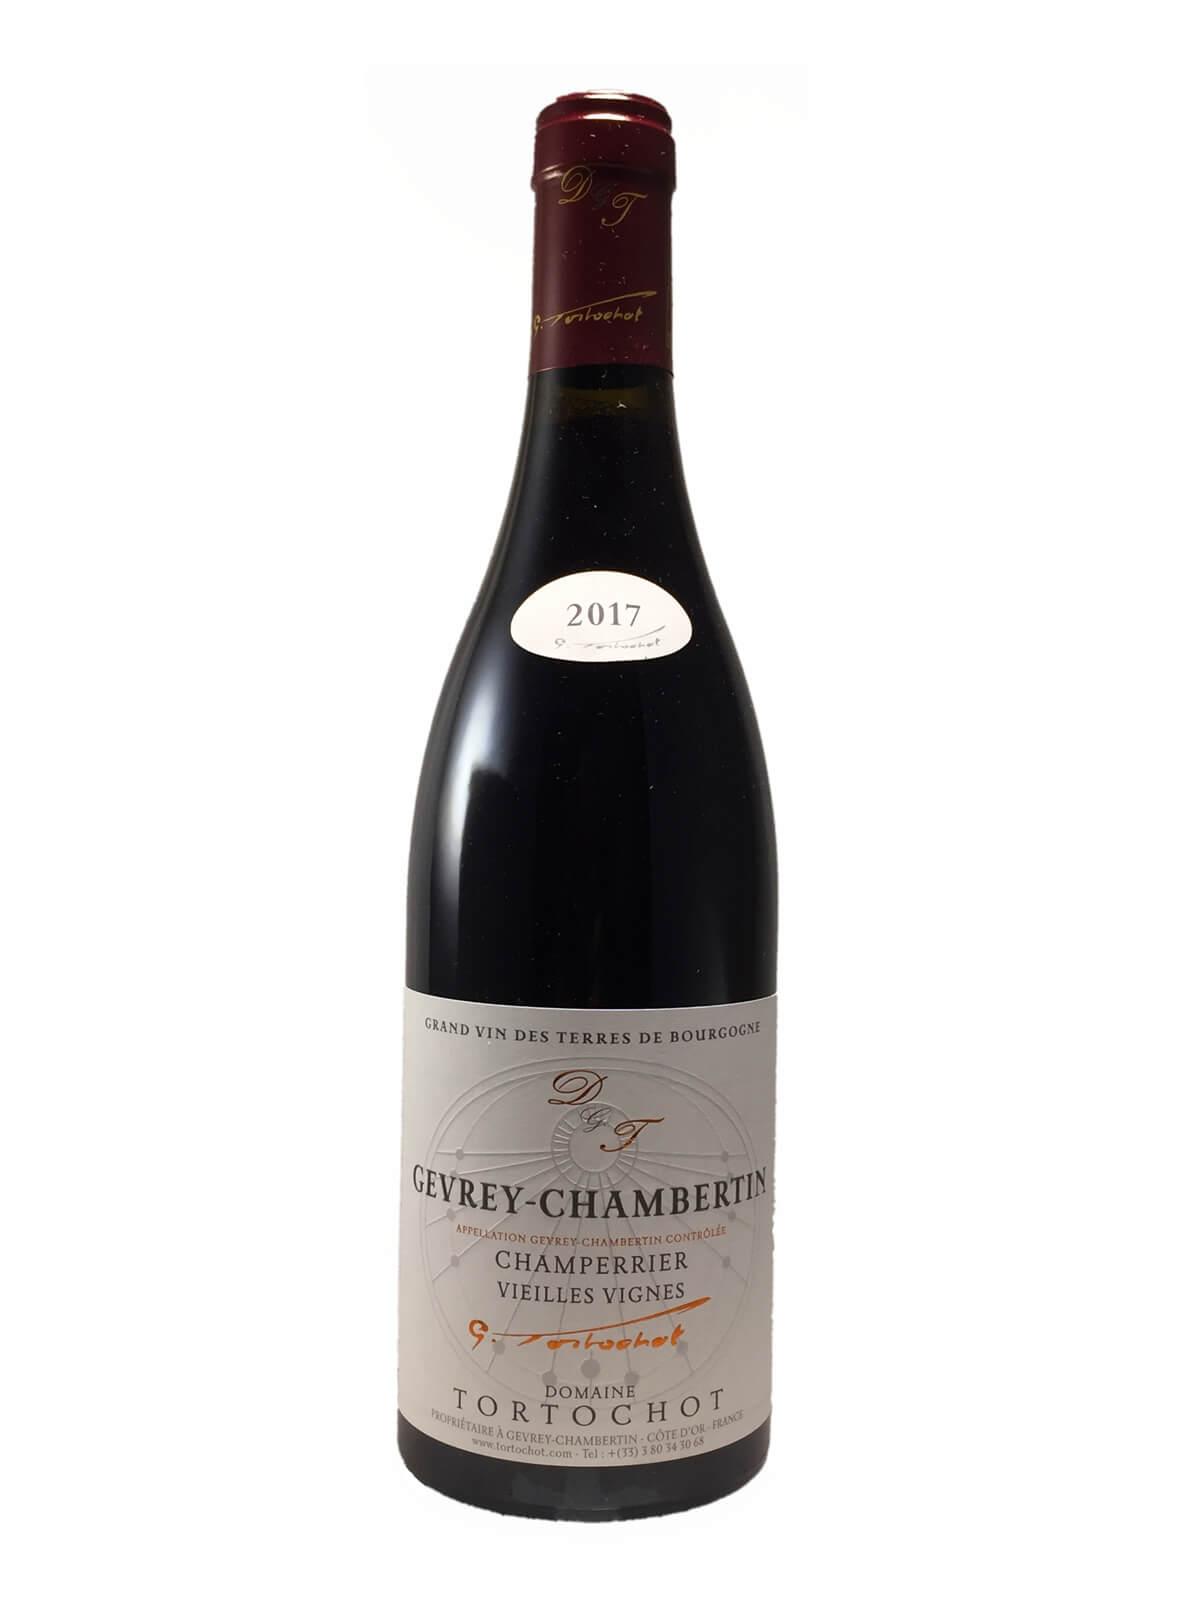 GEVREY CHAMBERTIN Champerrier Vieilles vignes 2017 Domaine TORTOCHOT